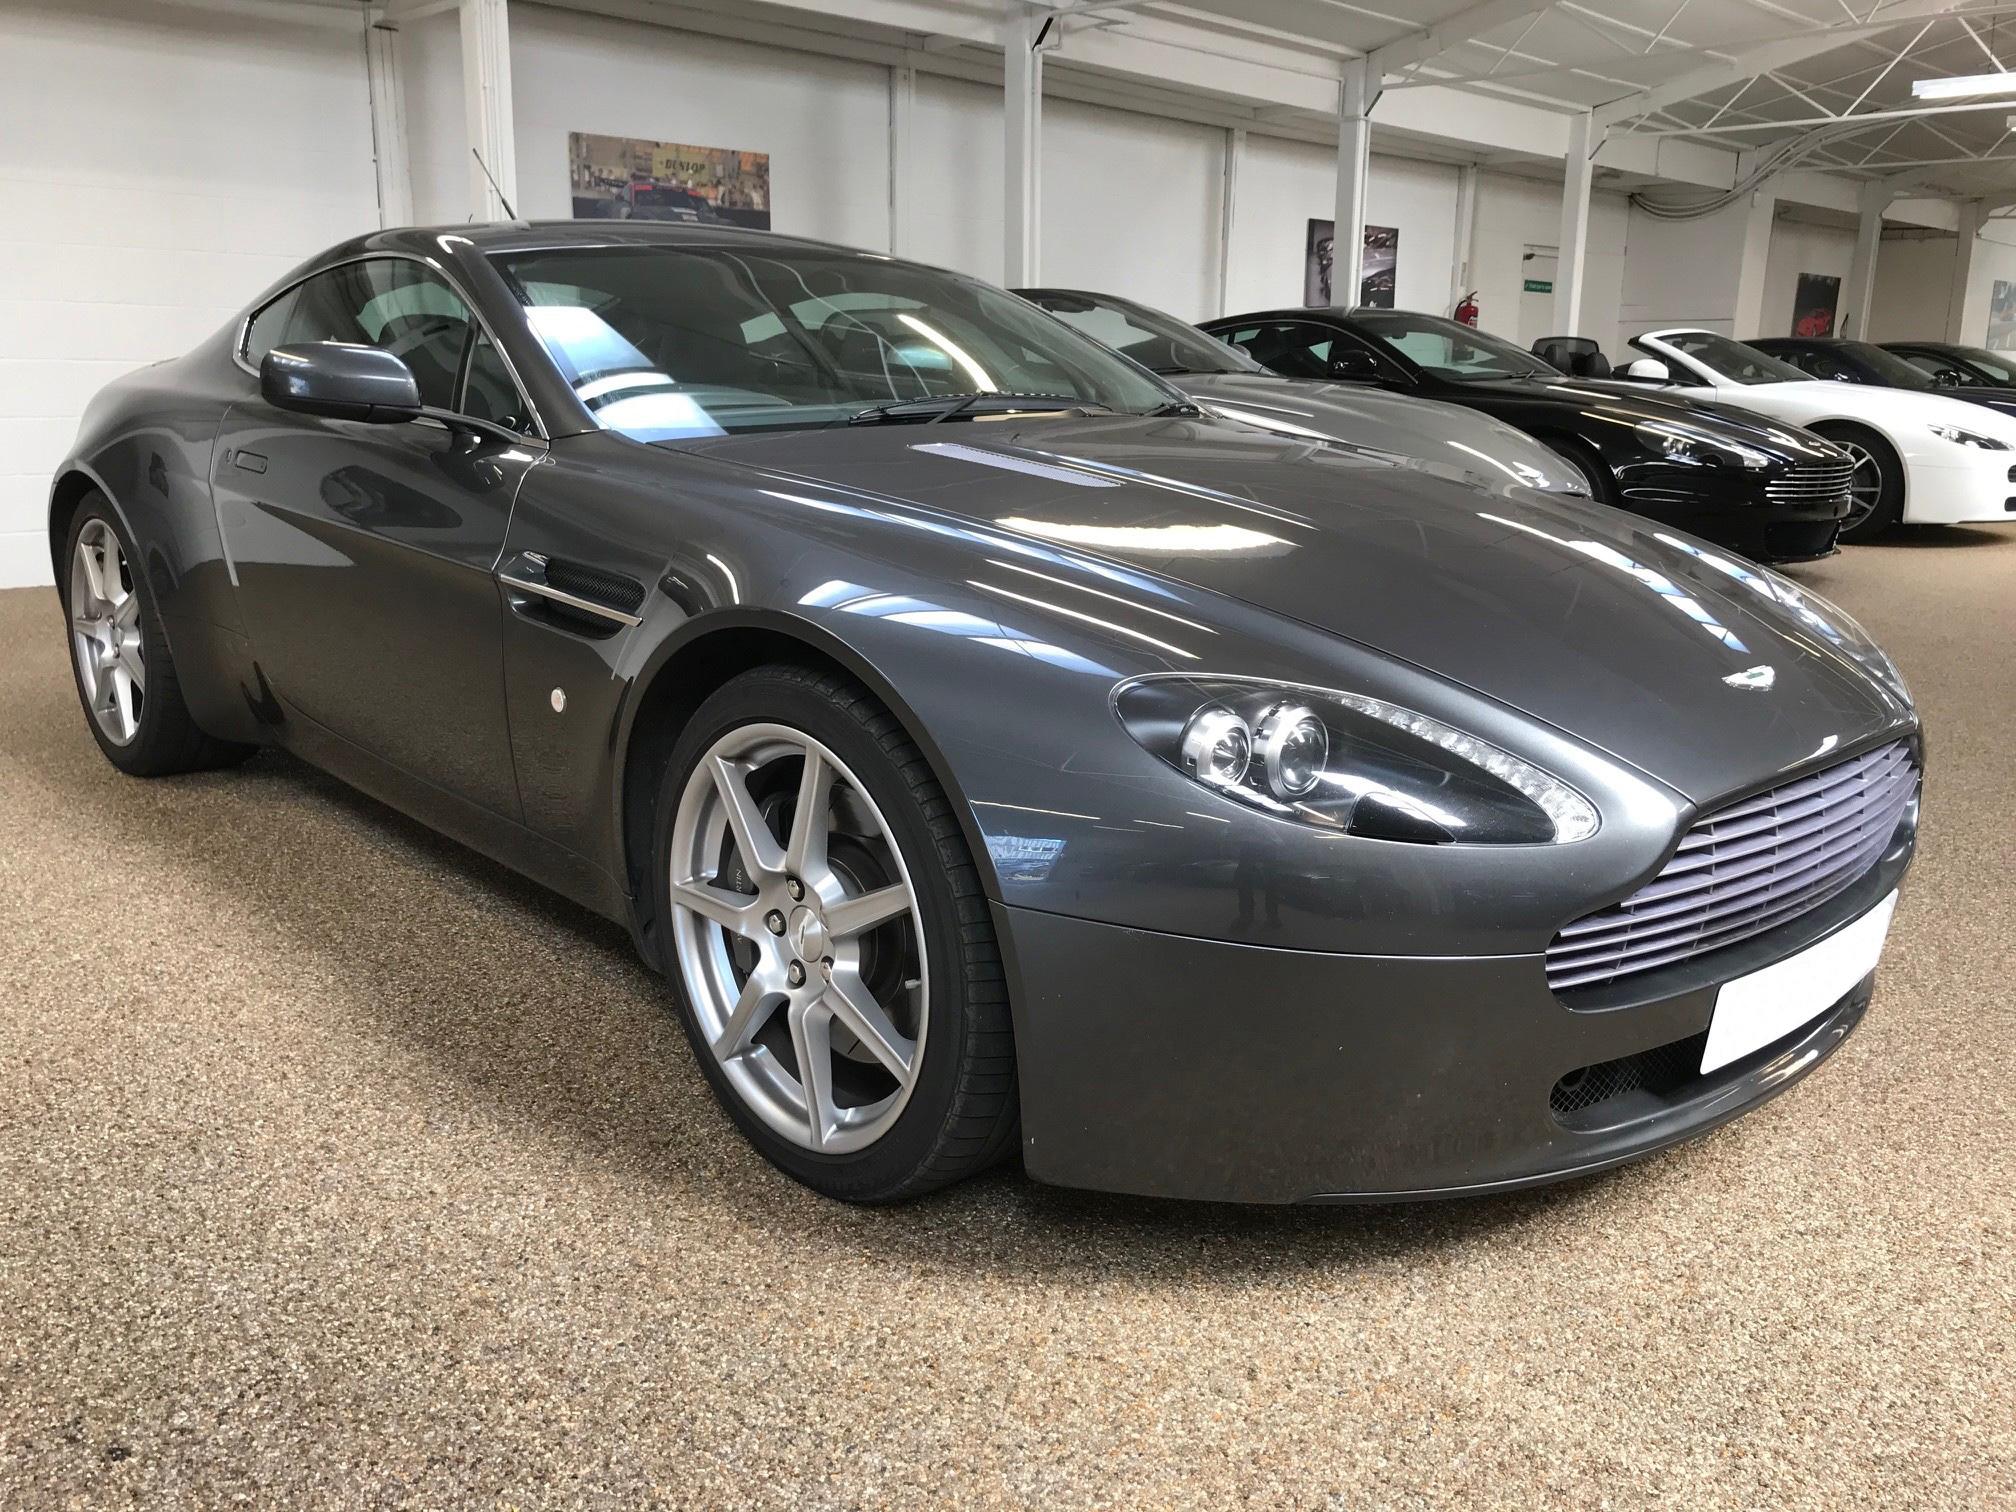 Used Aston Martin V8 Vantage for sale